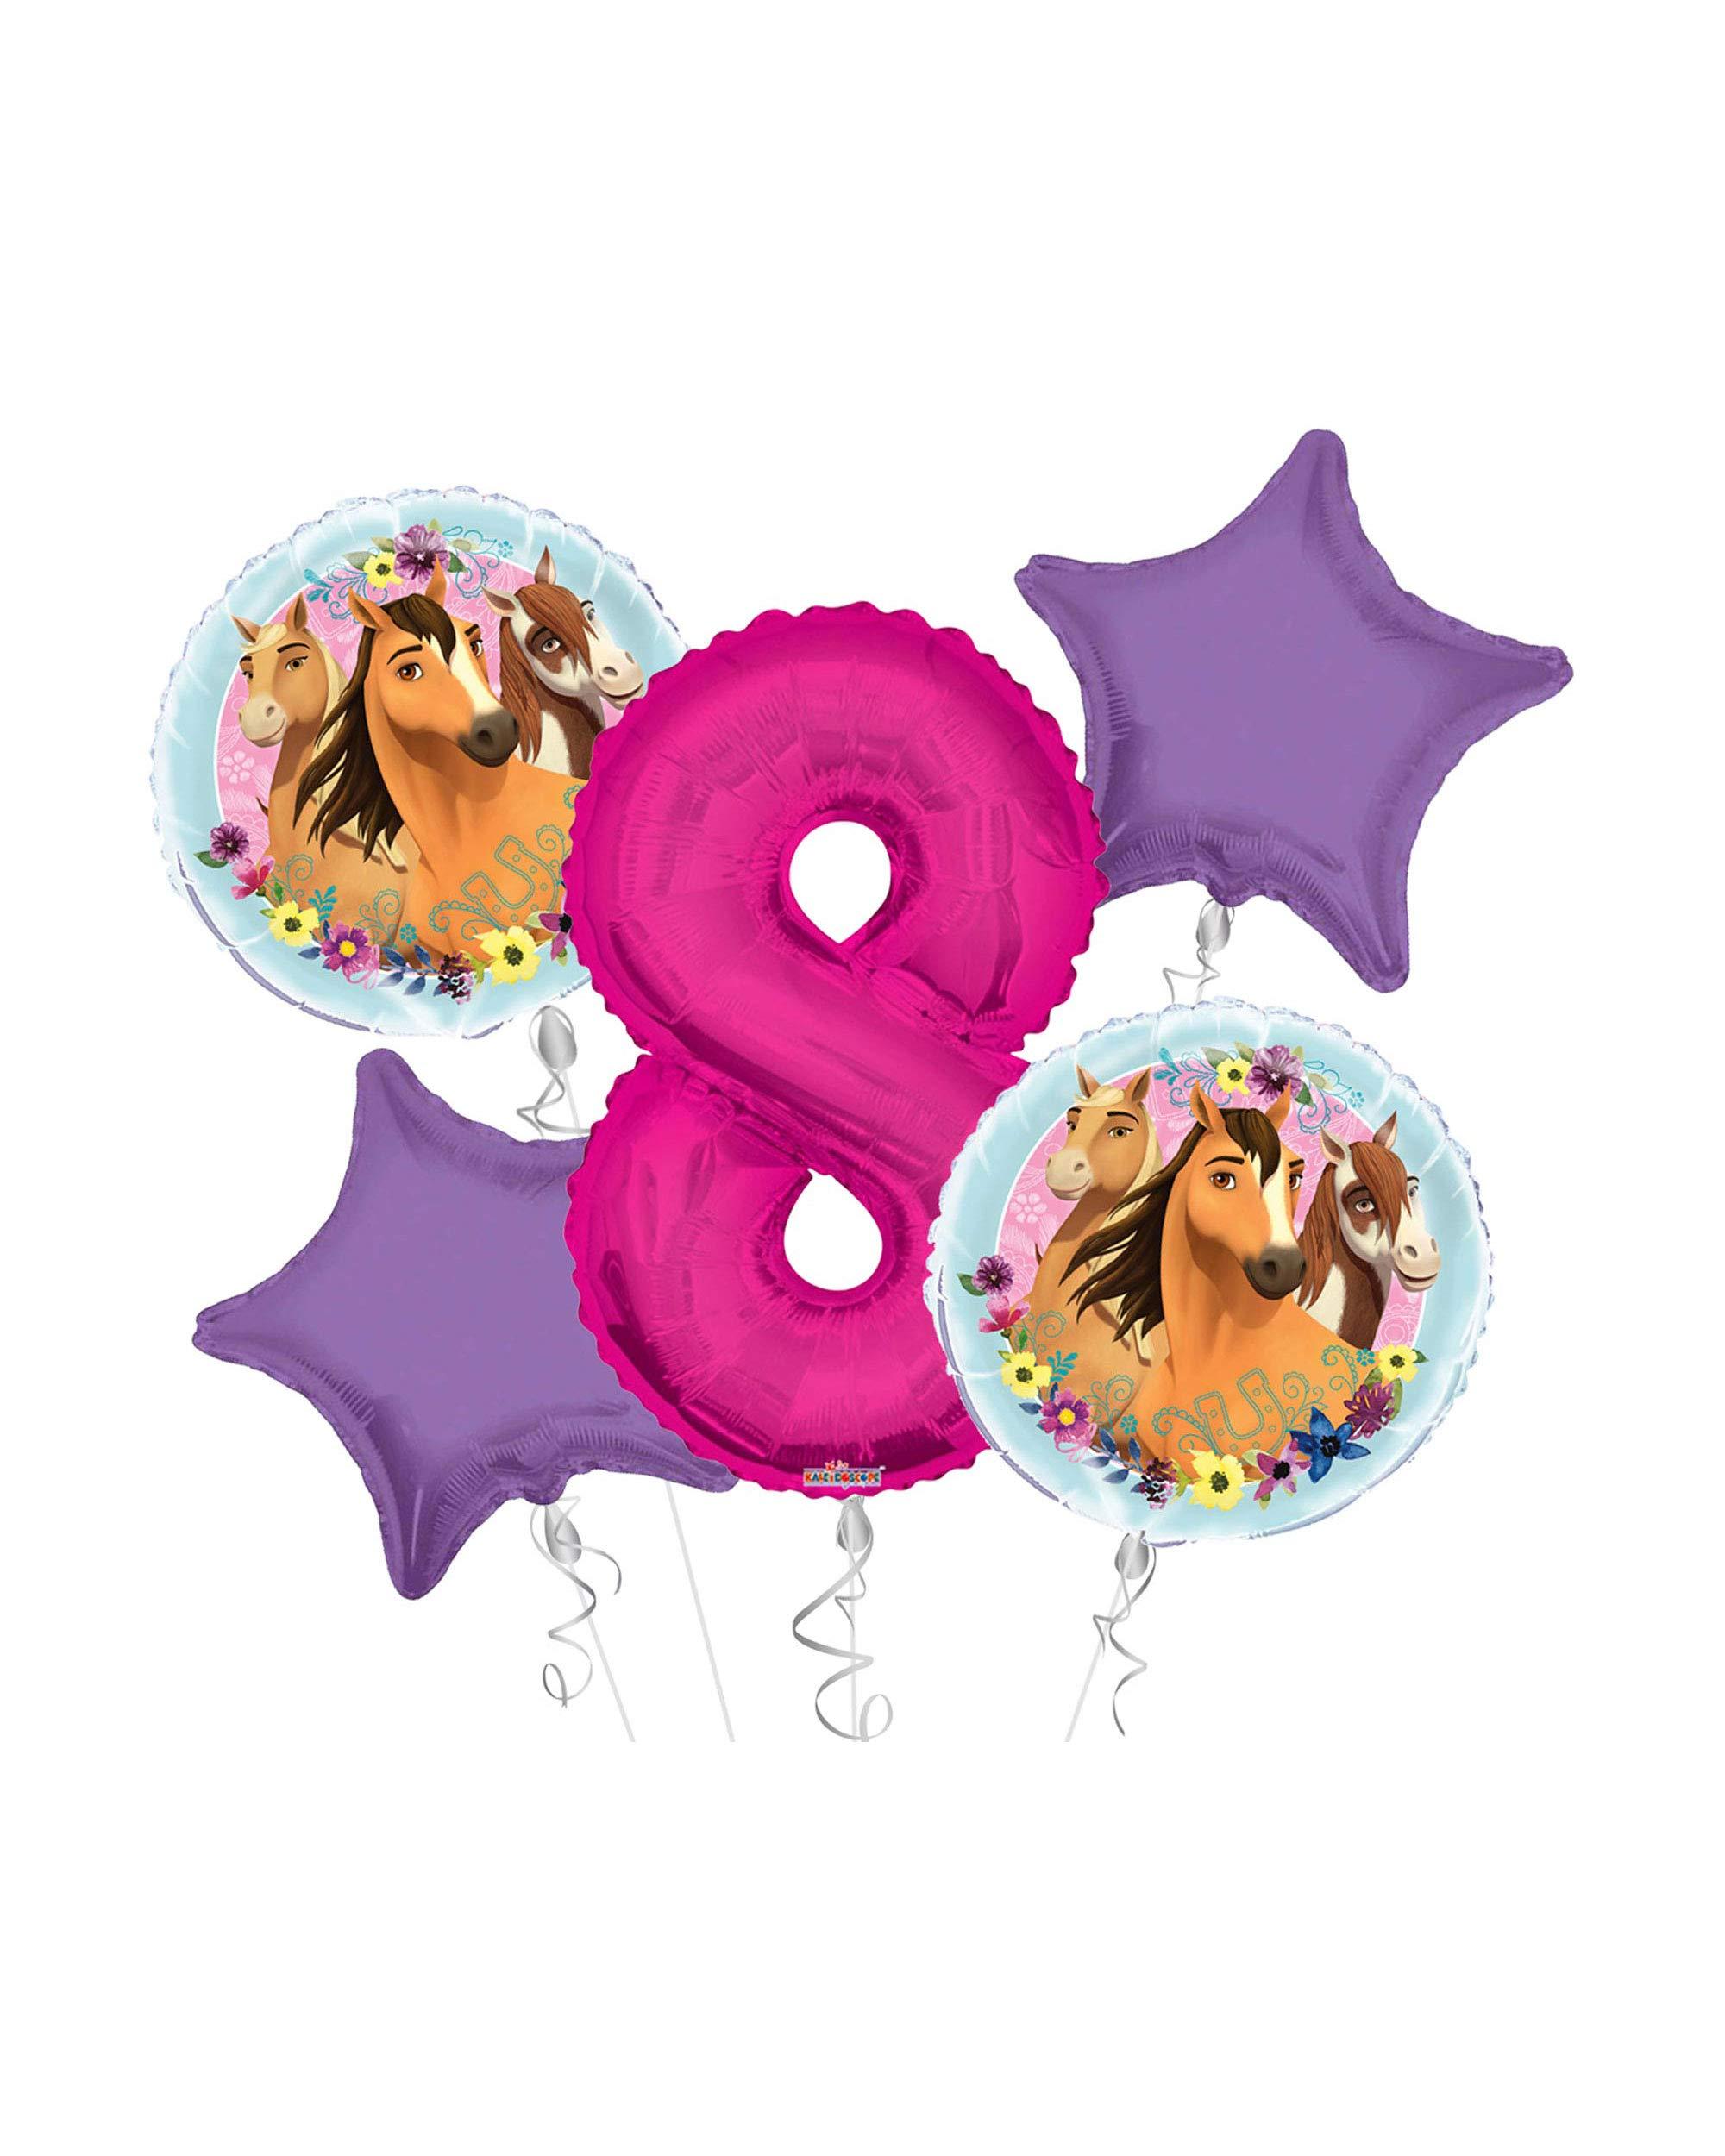 Anagram/Kaleidoscope Spirit Riding Free Happy Birthday Balloon Bouquet 5 pc, 8th Birthday, | Viva Party Balloon Collection